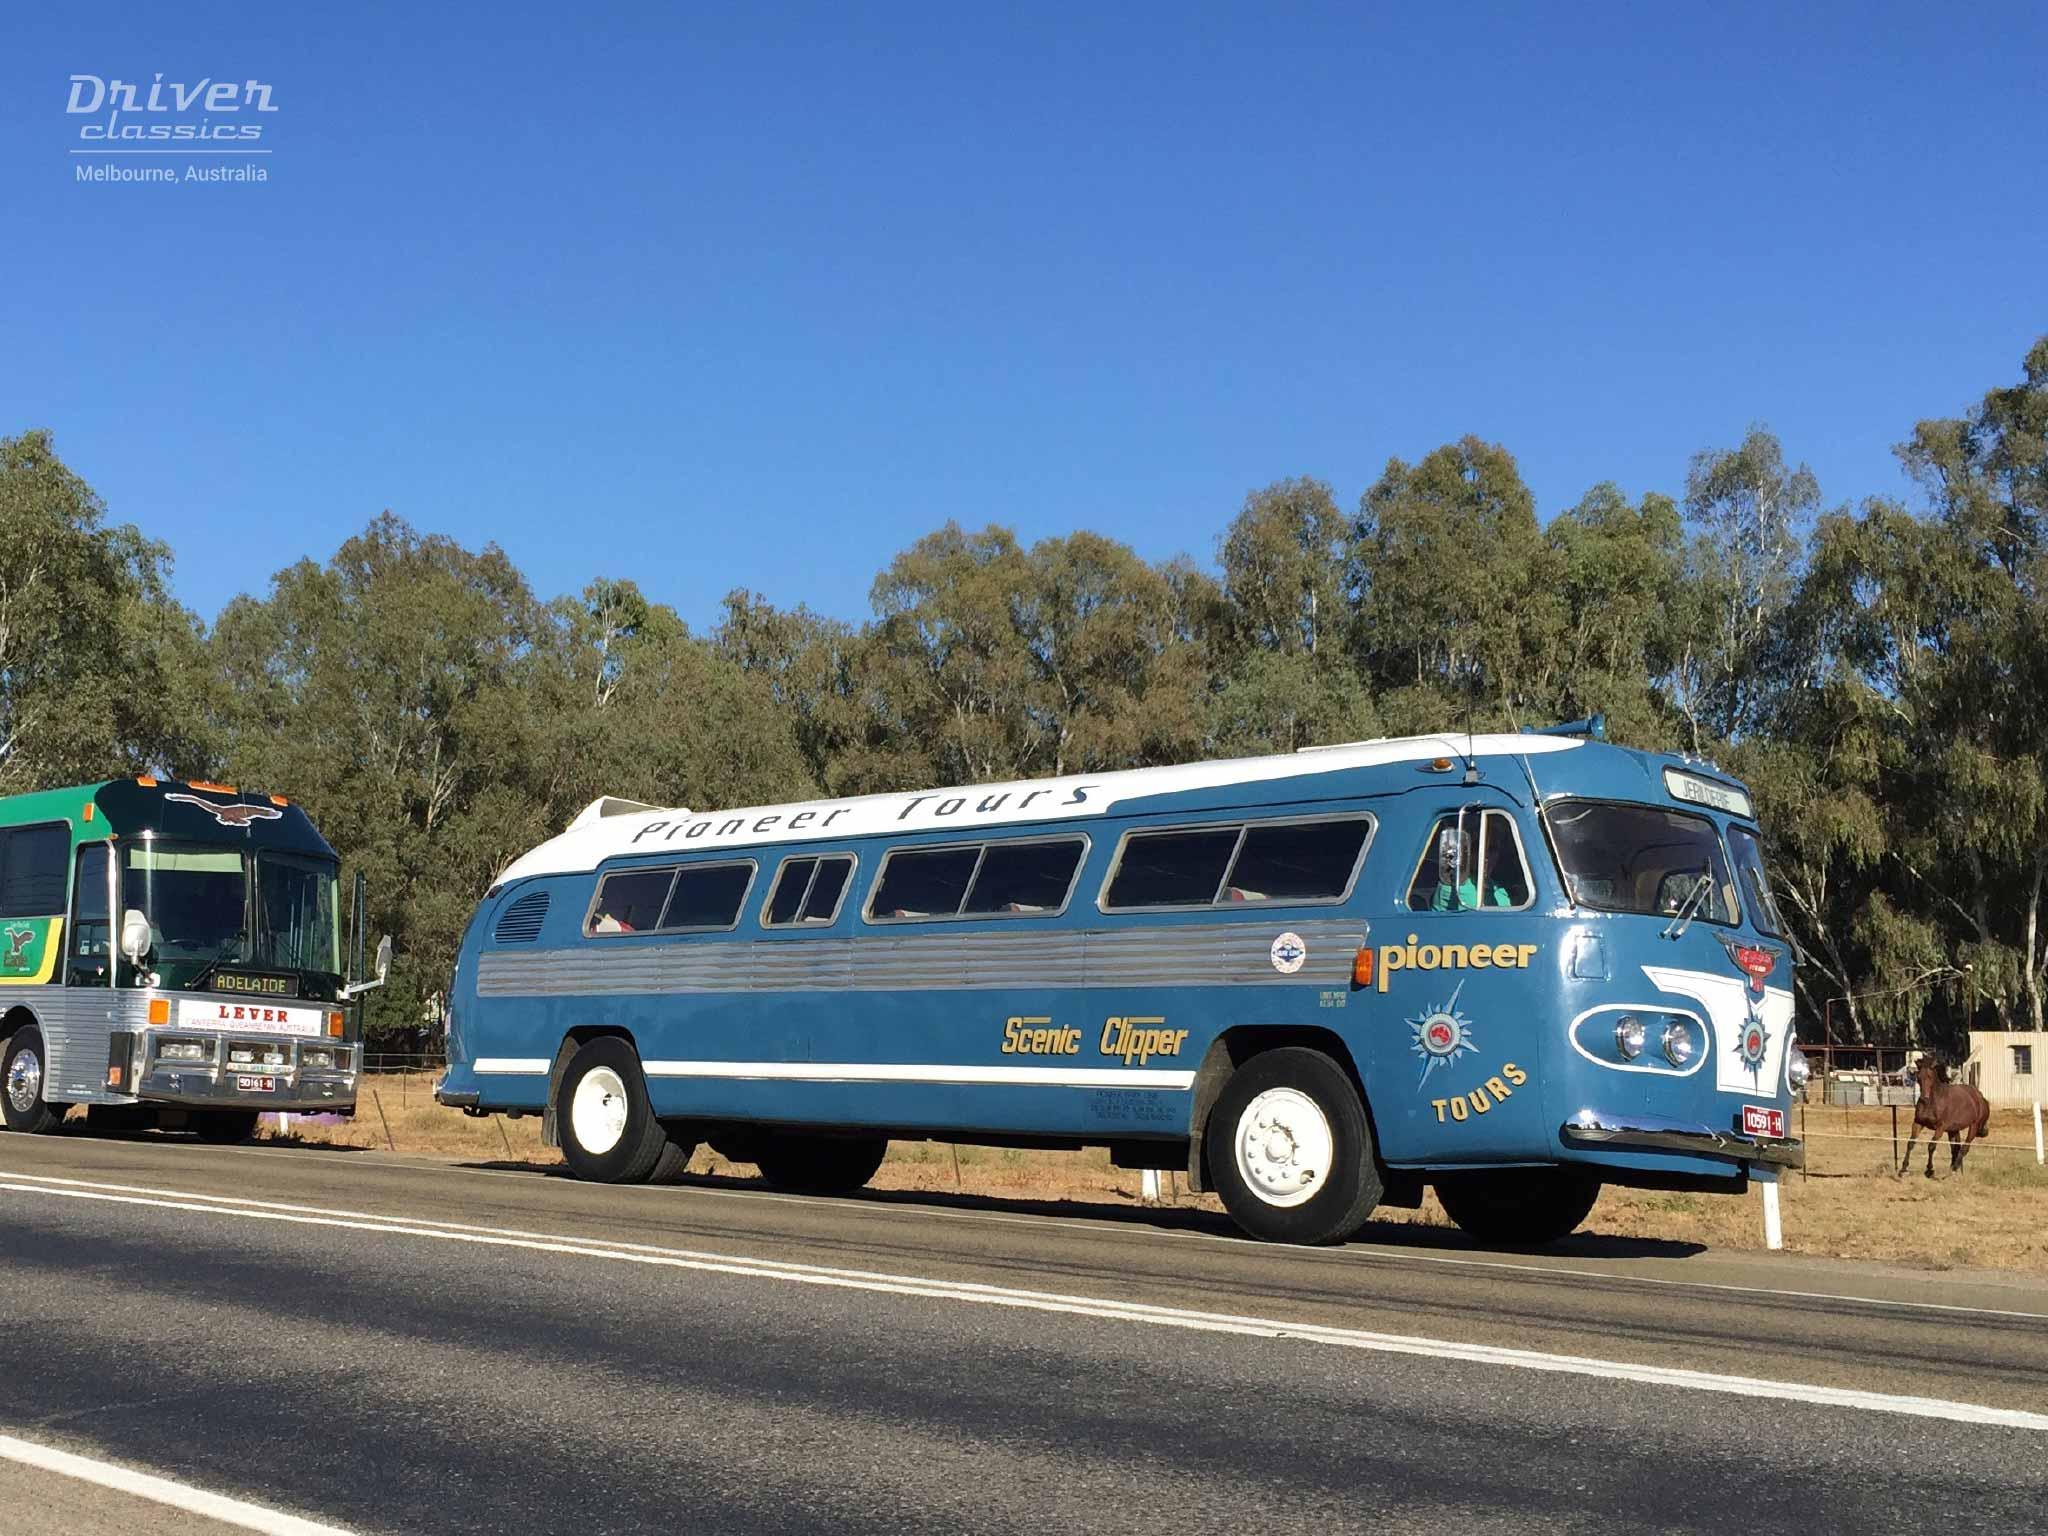 1954 Flxible Clipper bus at Wangaratta.